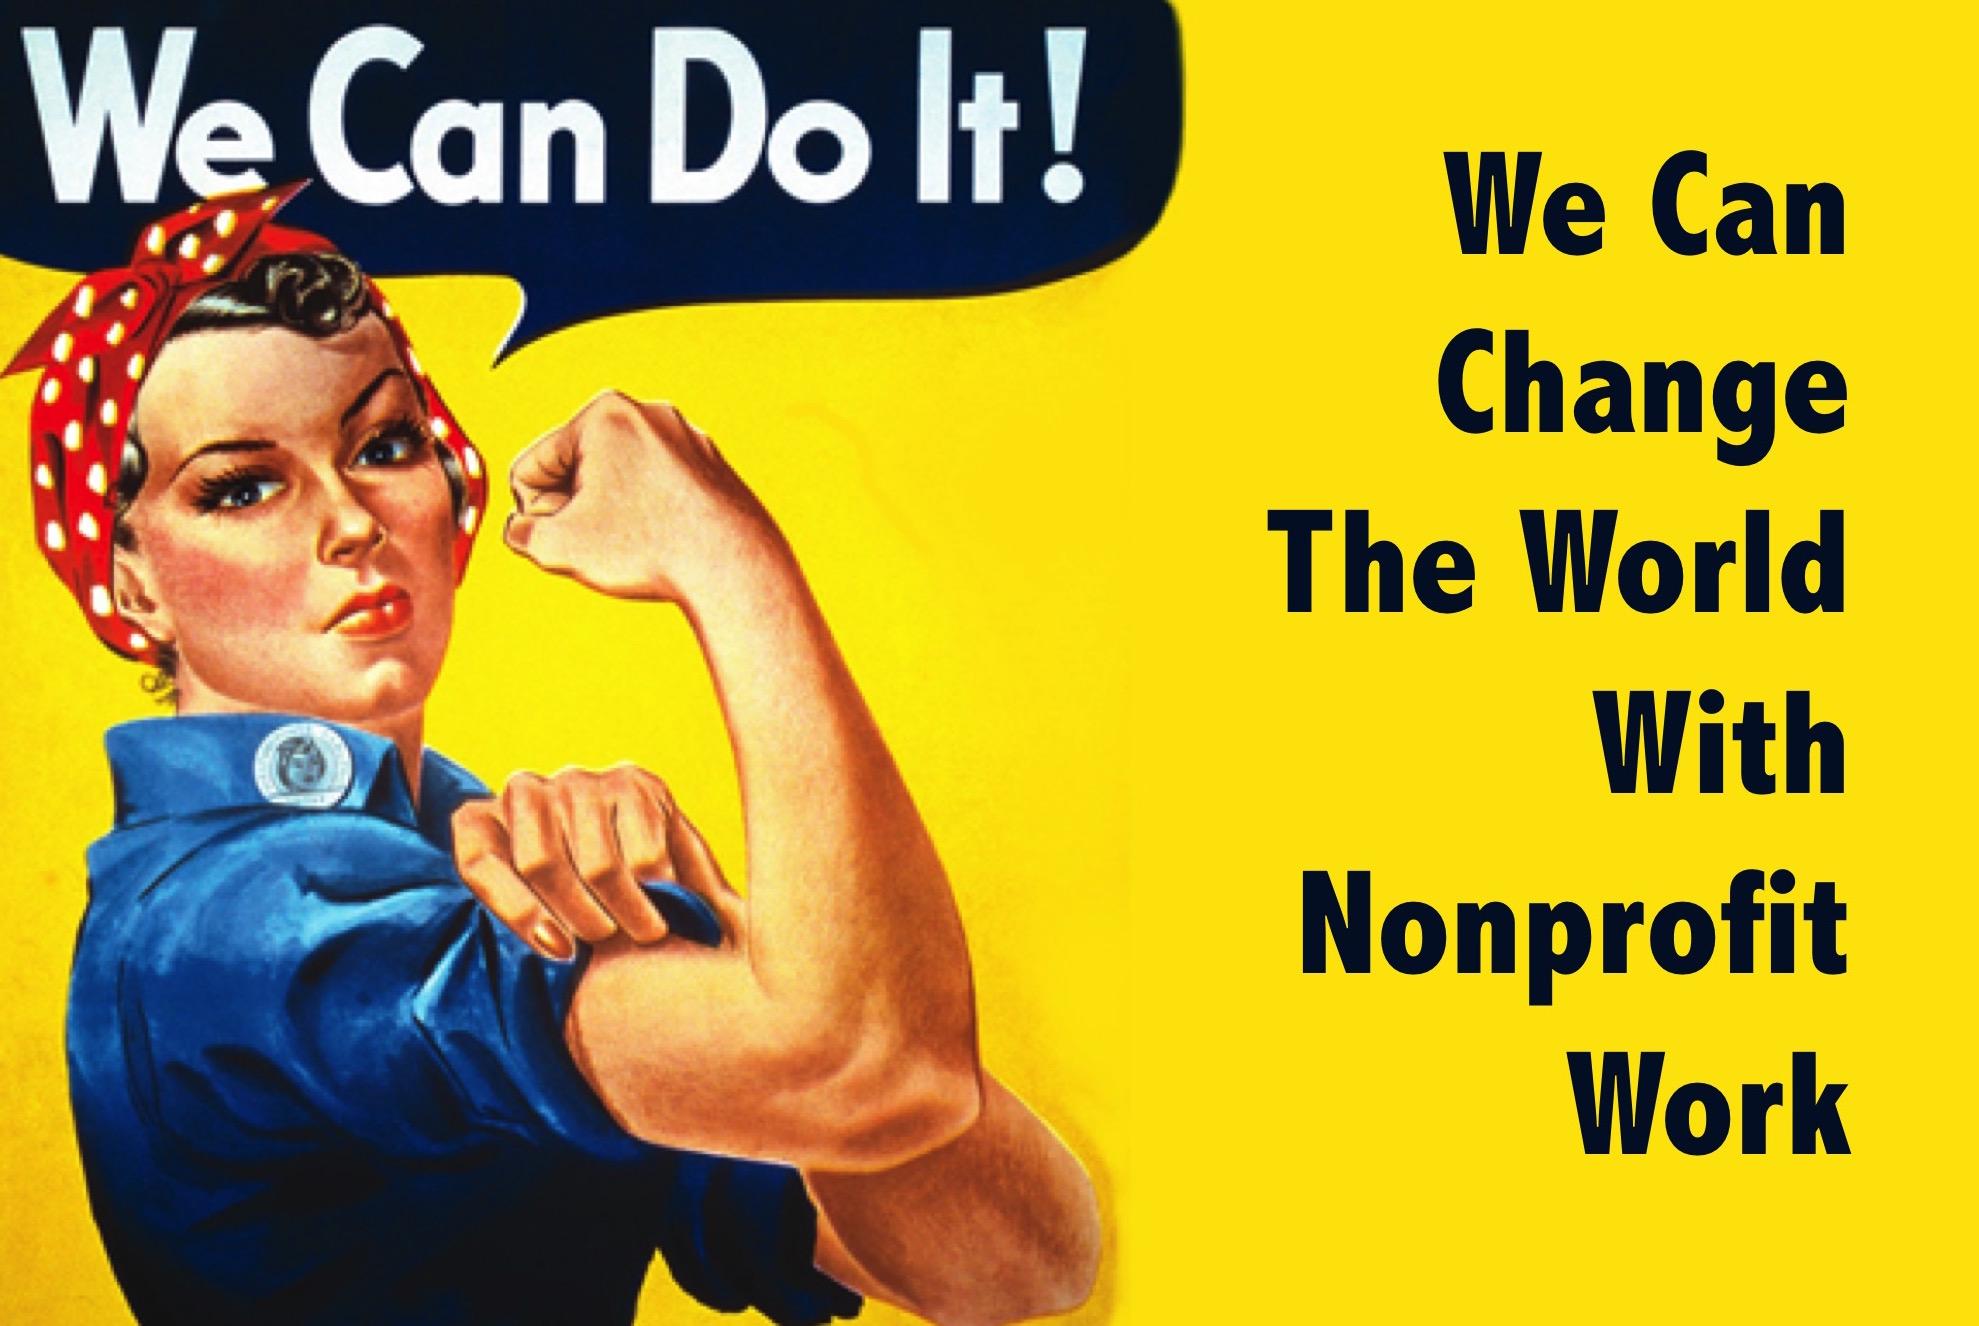 Yeswecan-Nonprofits